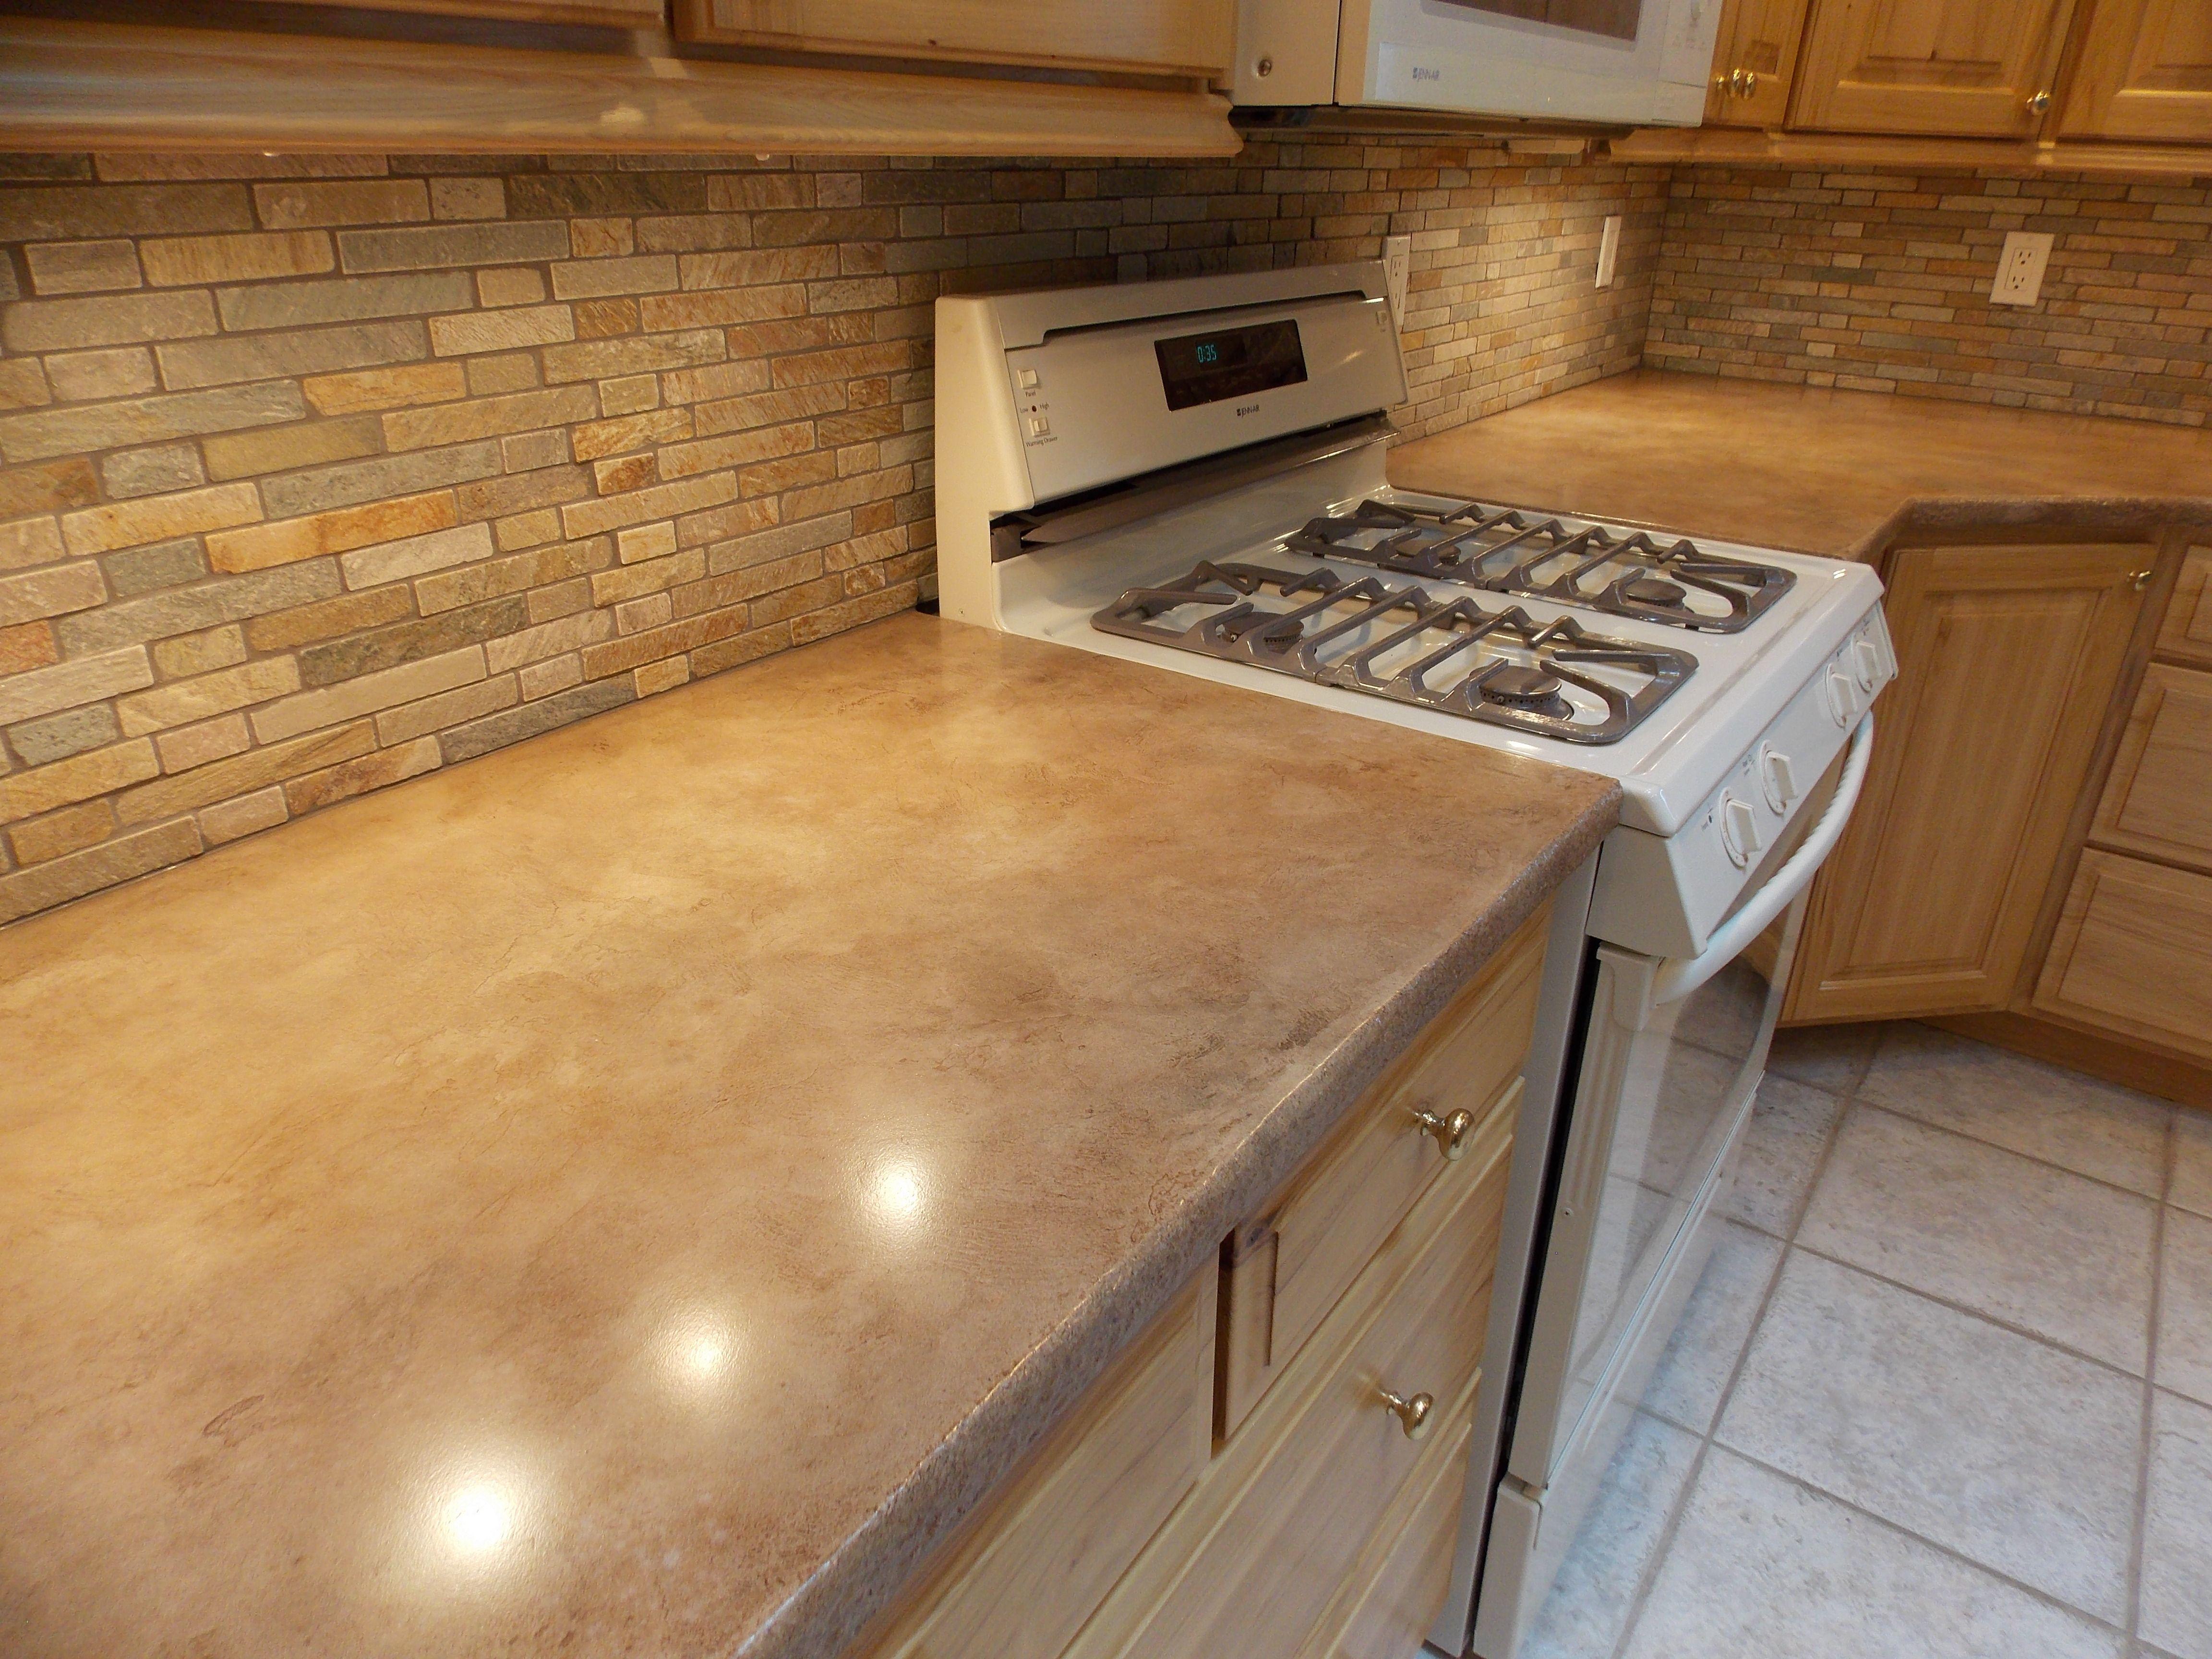 Good Concrete Overlay Counters U0026 Tile Backsplash Rapid City, SD   Surface  Innovations LLC   Custom